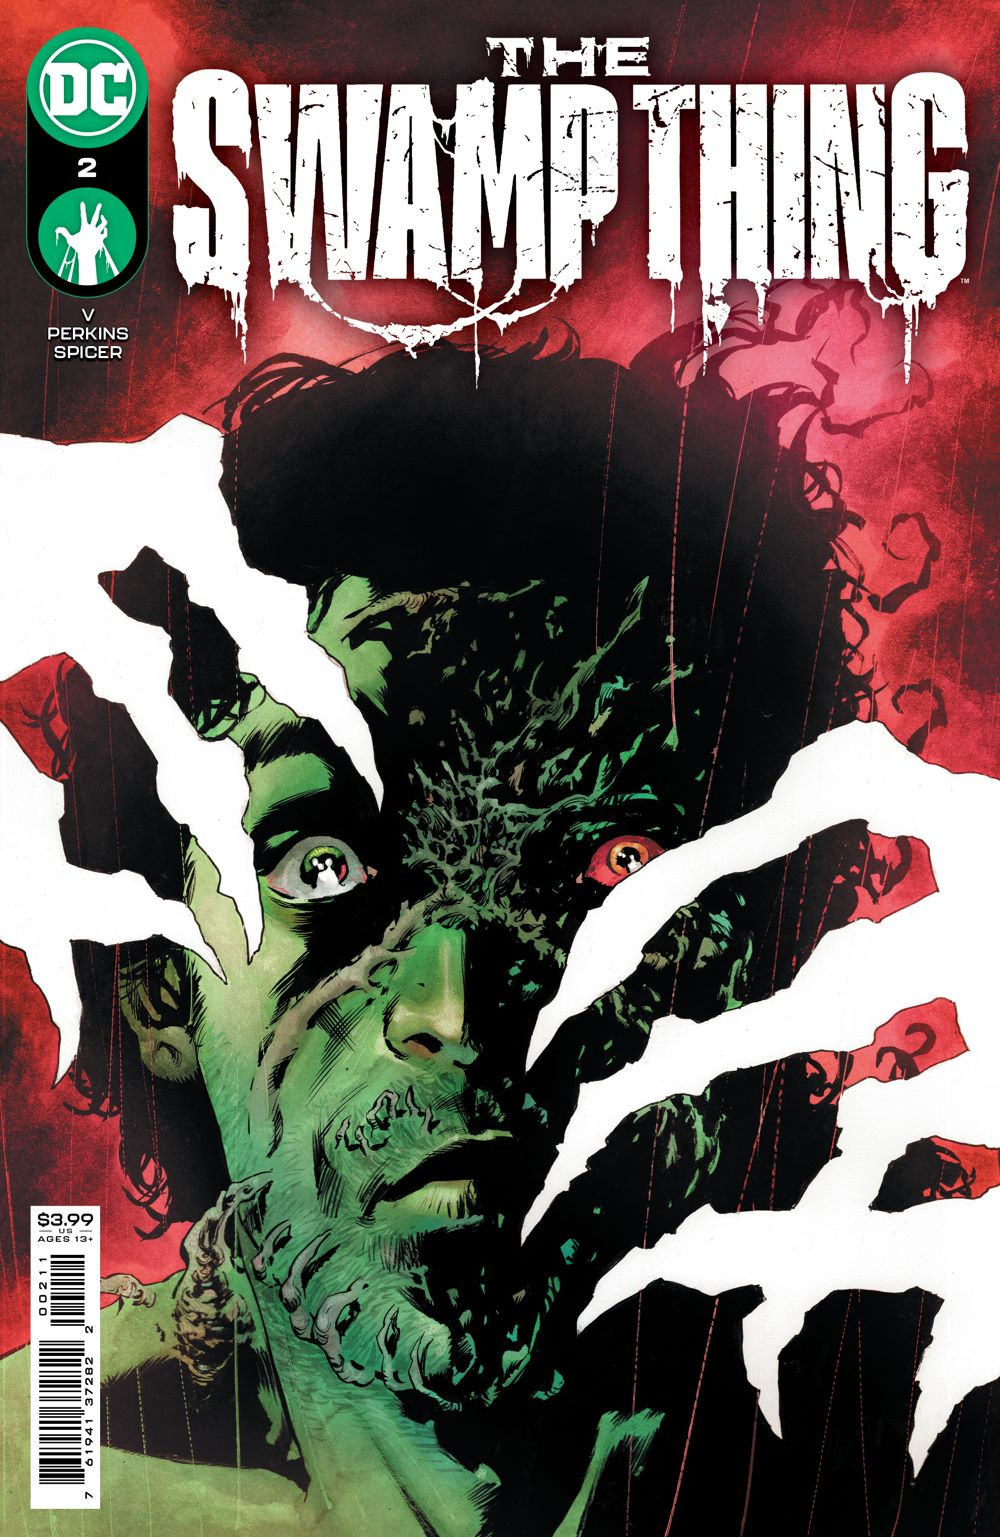 SWAMPTHING_Cv2 DC Comics April 2021 Solicitations